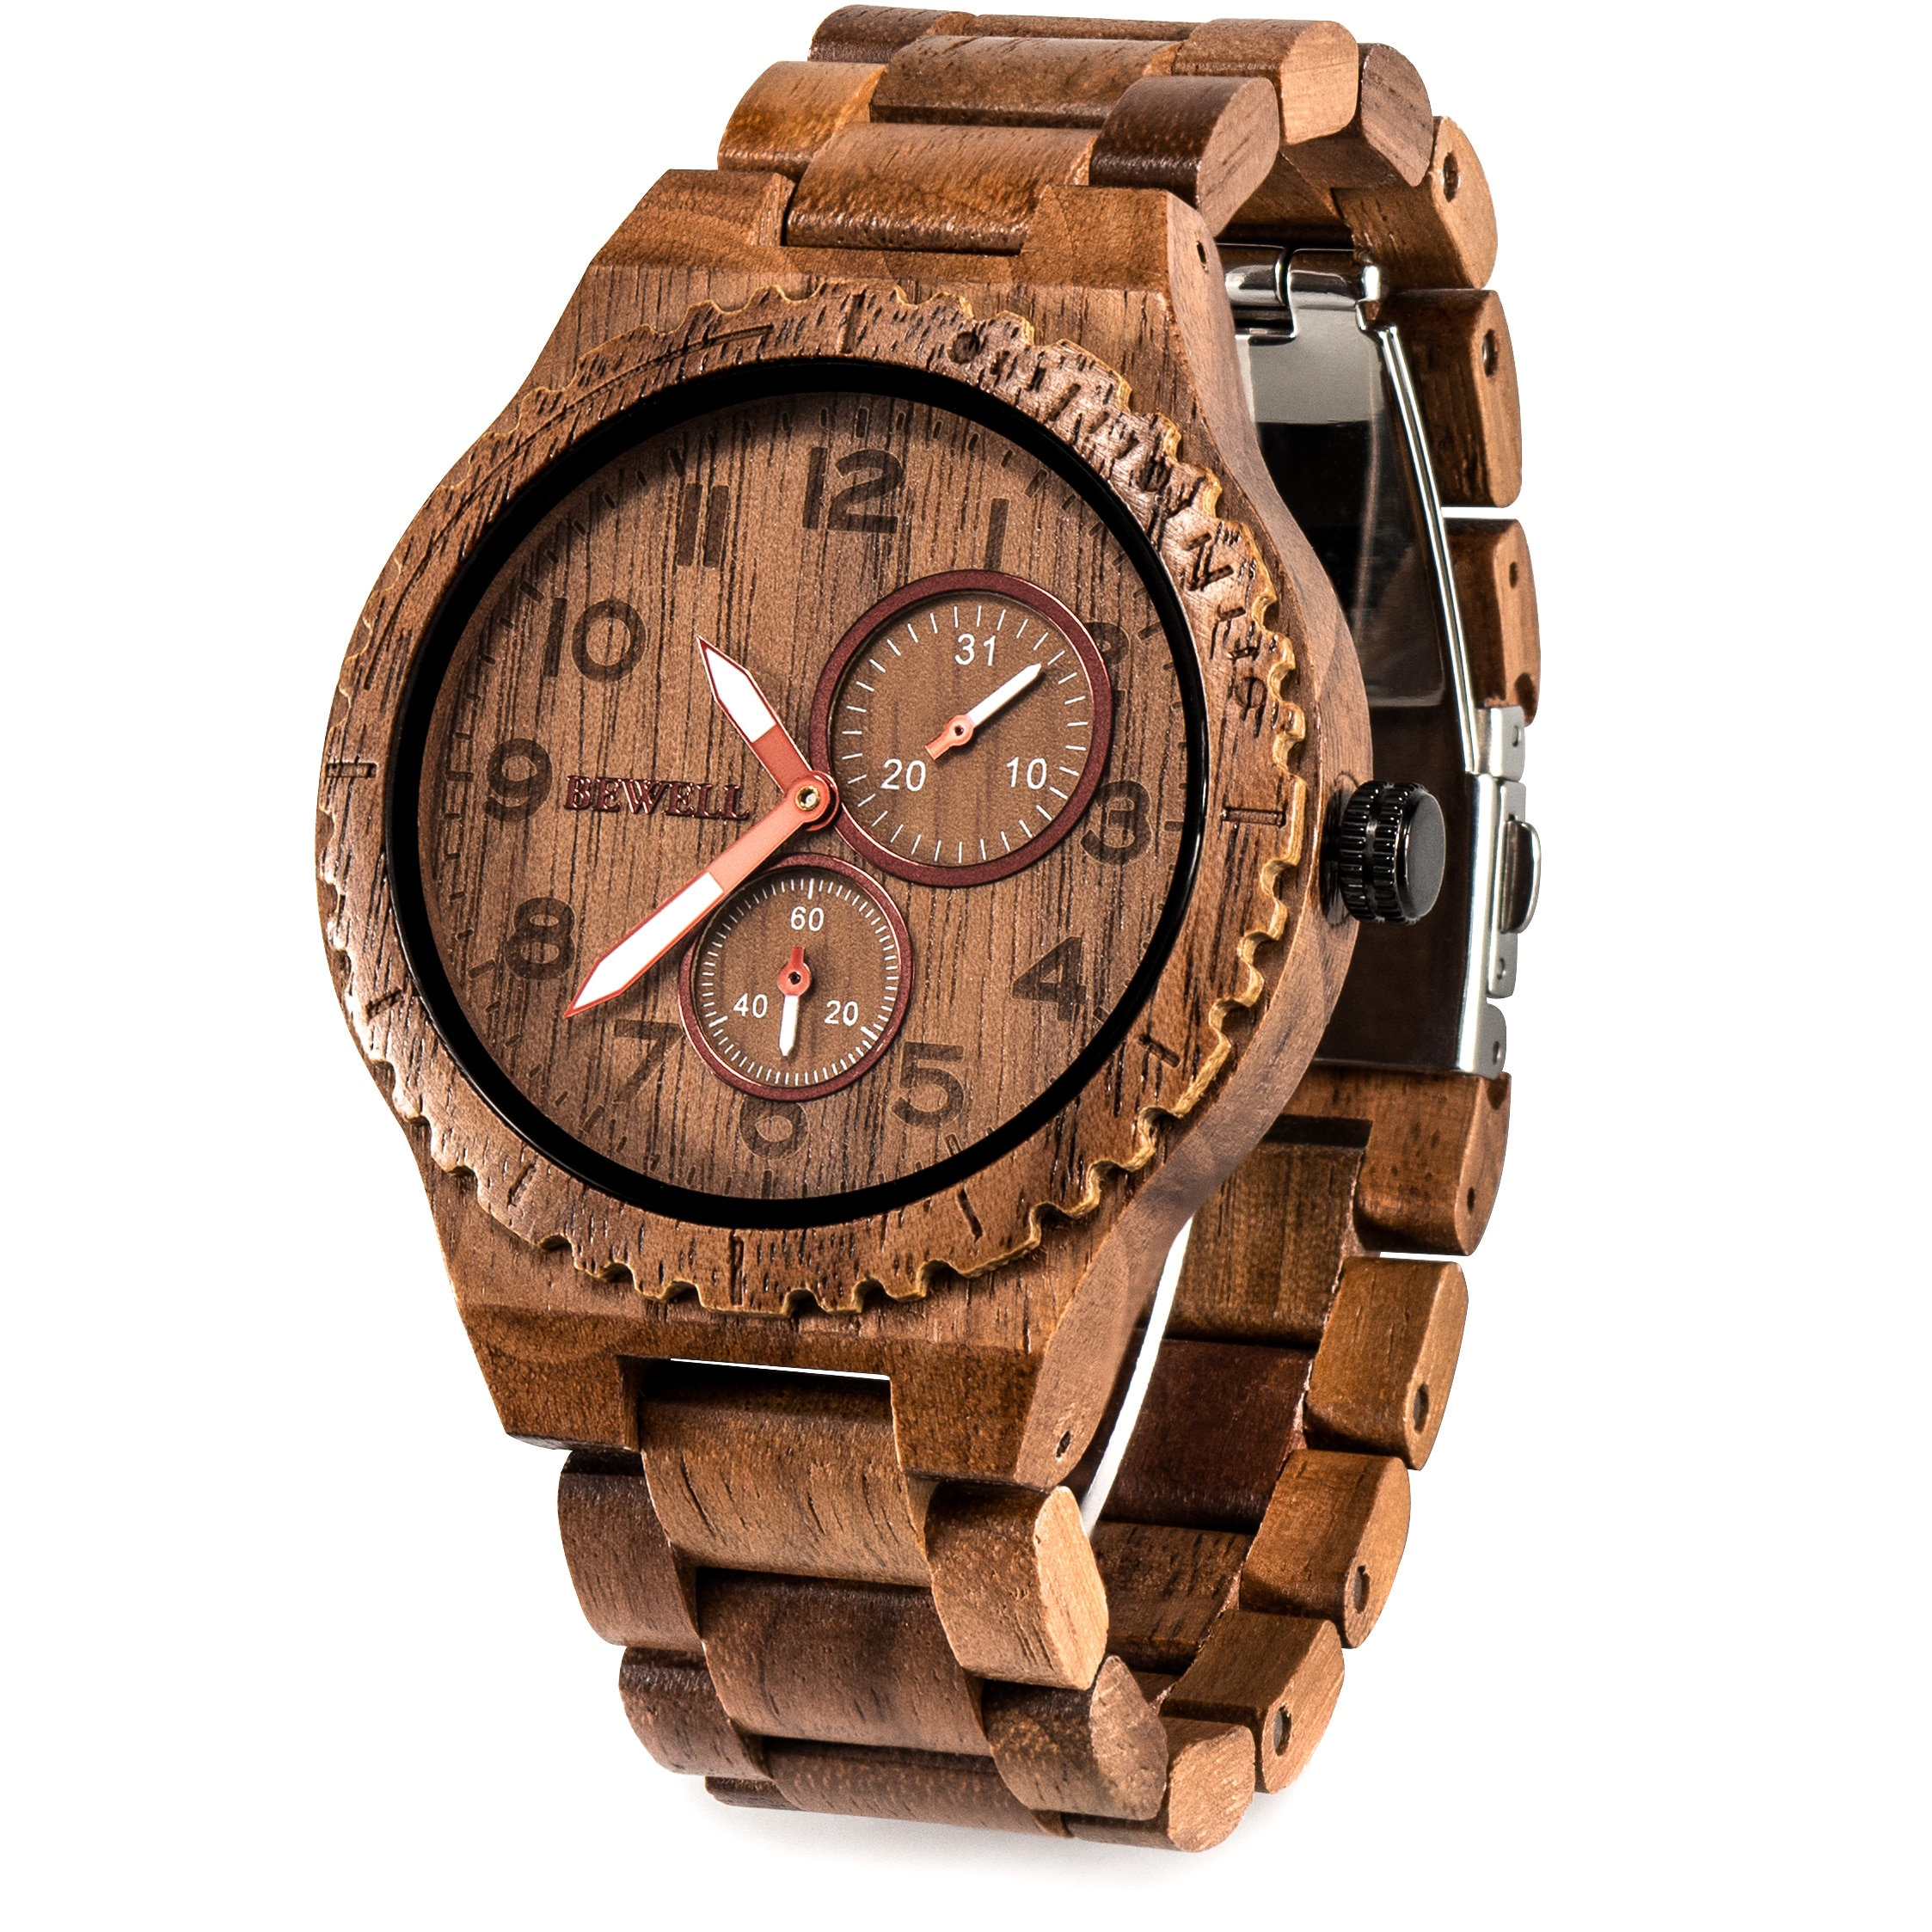 BEWELL деревянные часы Мужские кварцевые повседневные Ретро часы reloj hombre легкие светящиеся деревянные часы для мужчин Relogio Masculino W154A